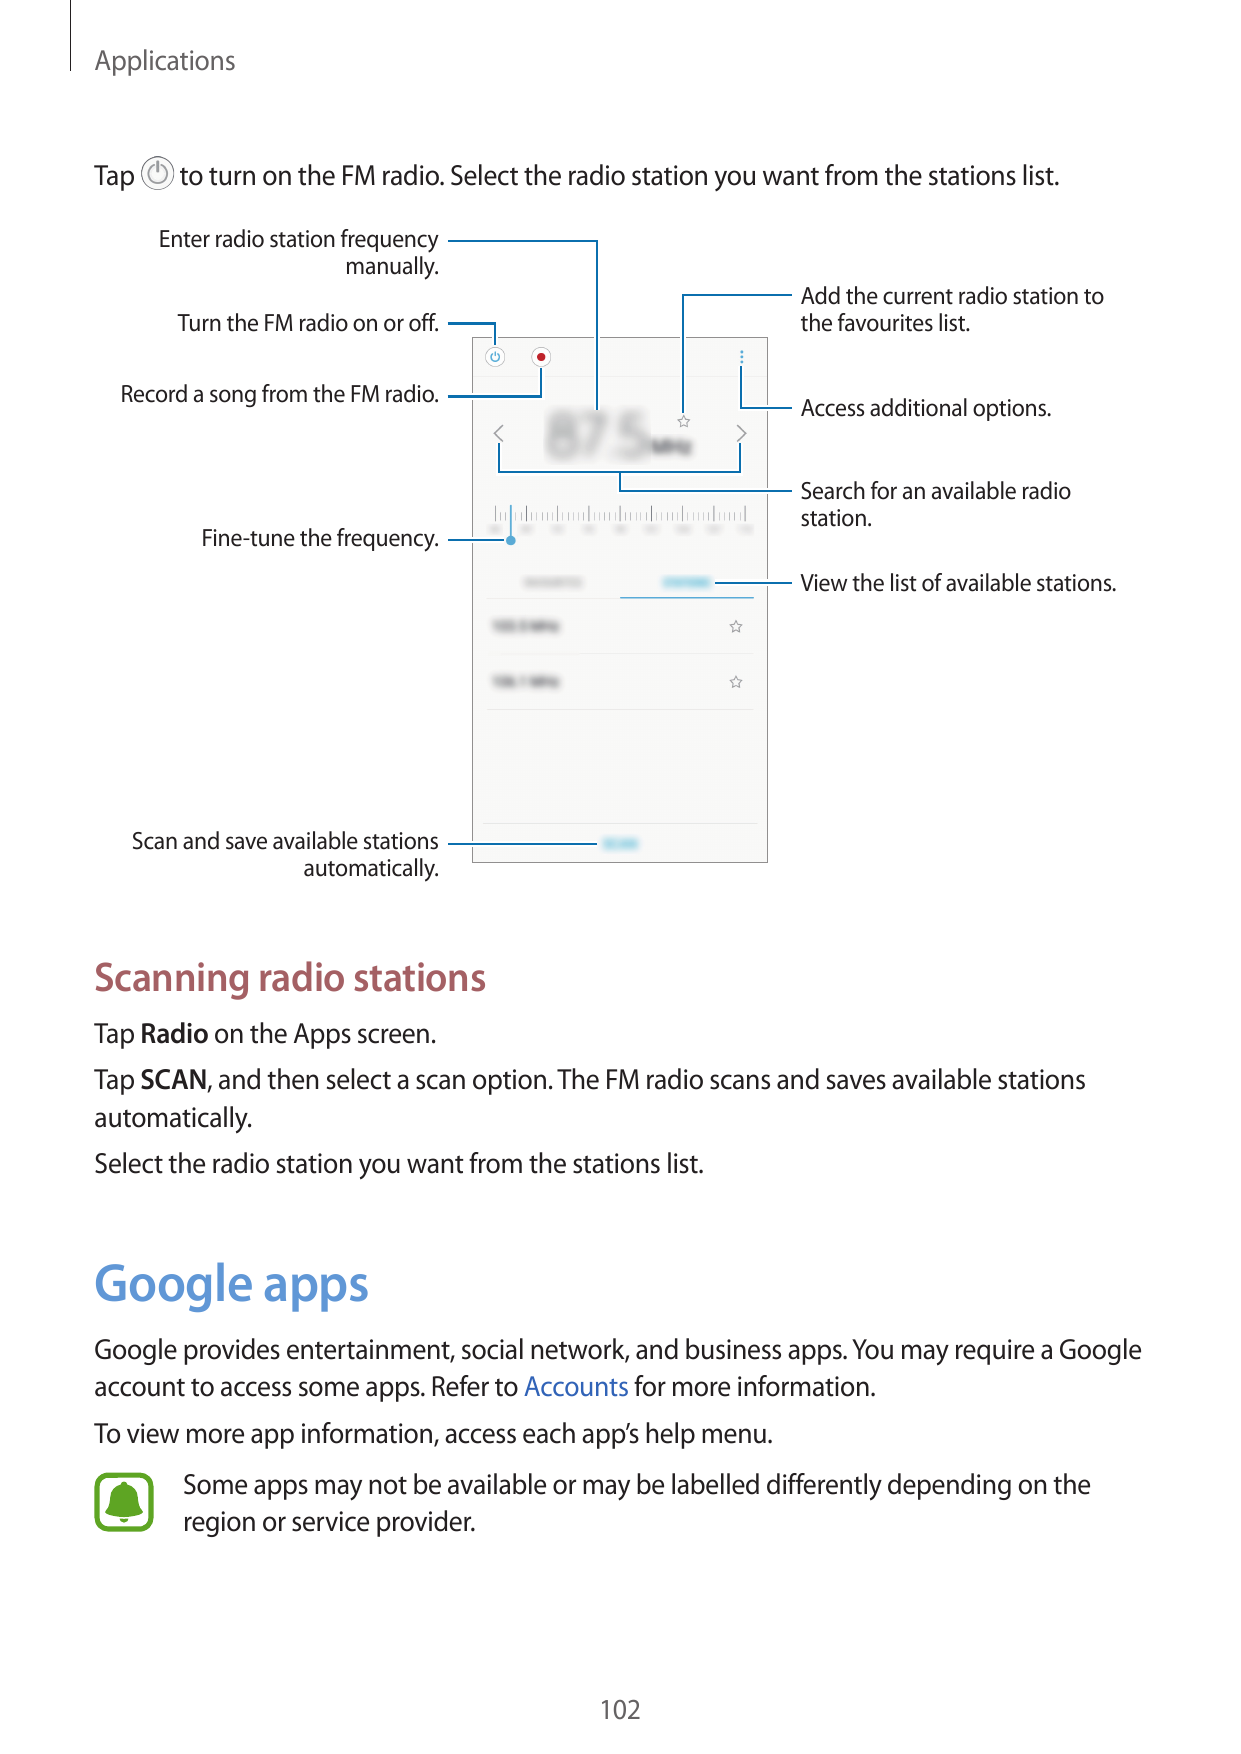 Manual - Samsung Galaxy J7 Pro (2017) - Android 7 0 - Smart